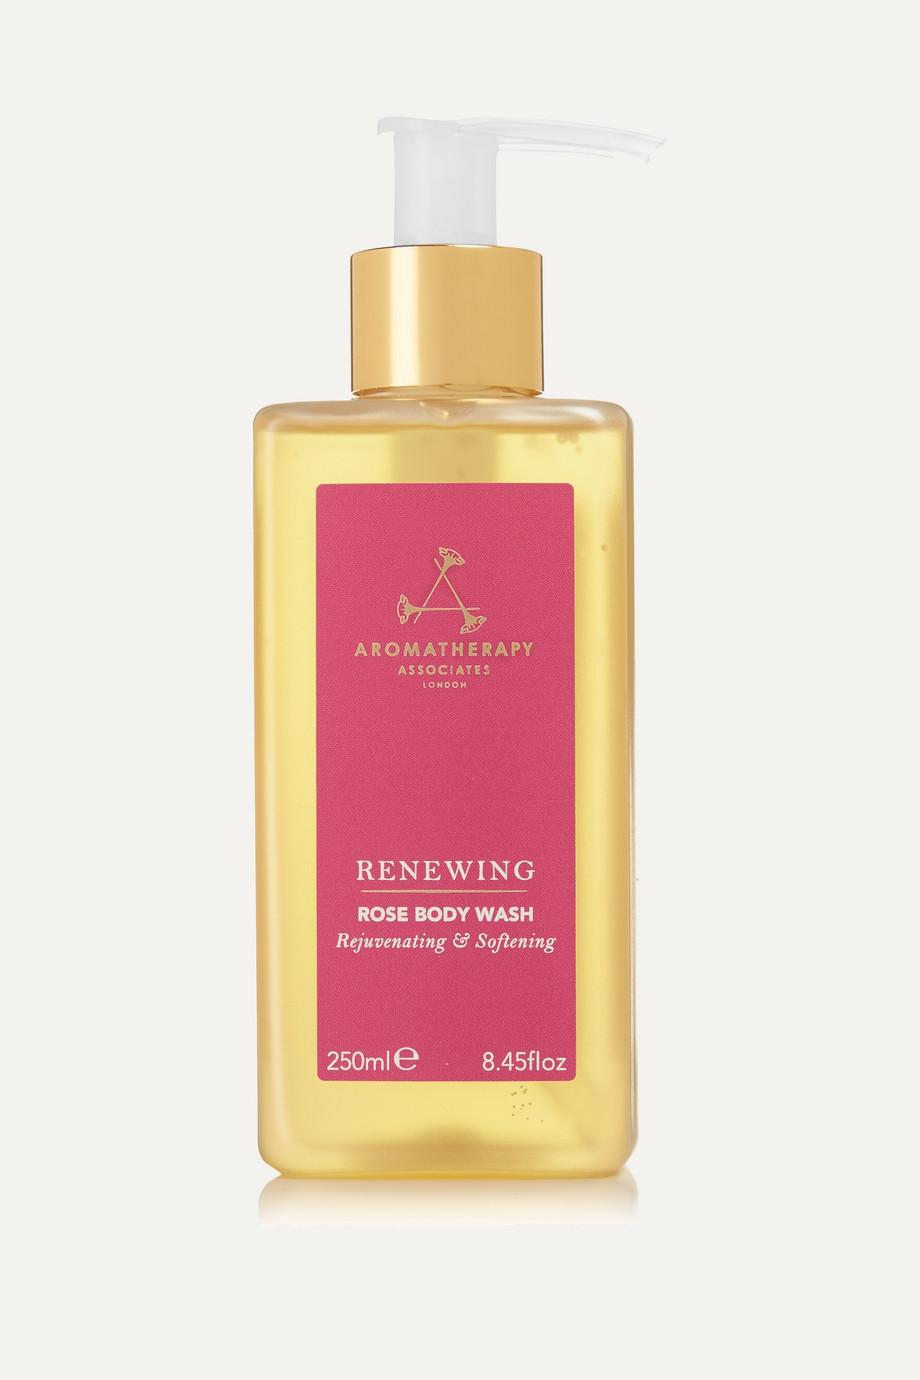 Aromatherapy Associates Renewing Rose Body Wash, 250ml